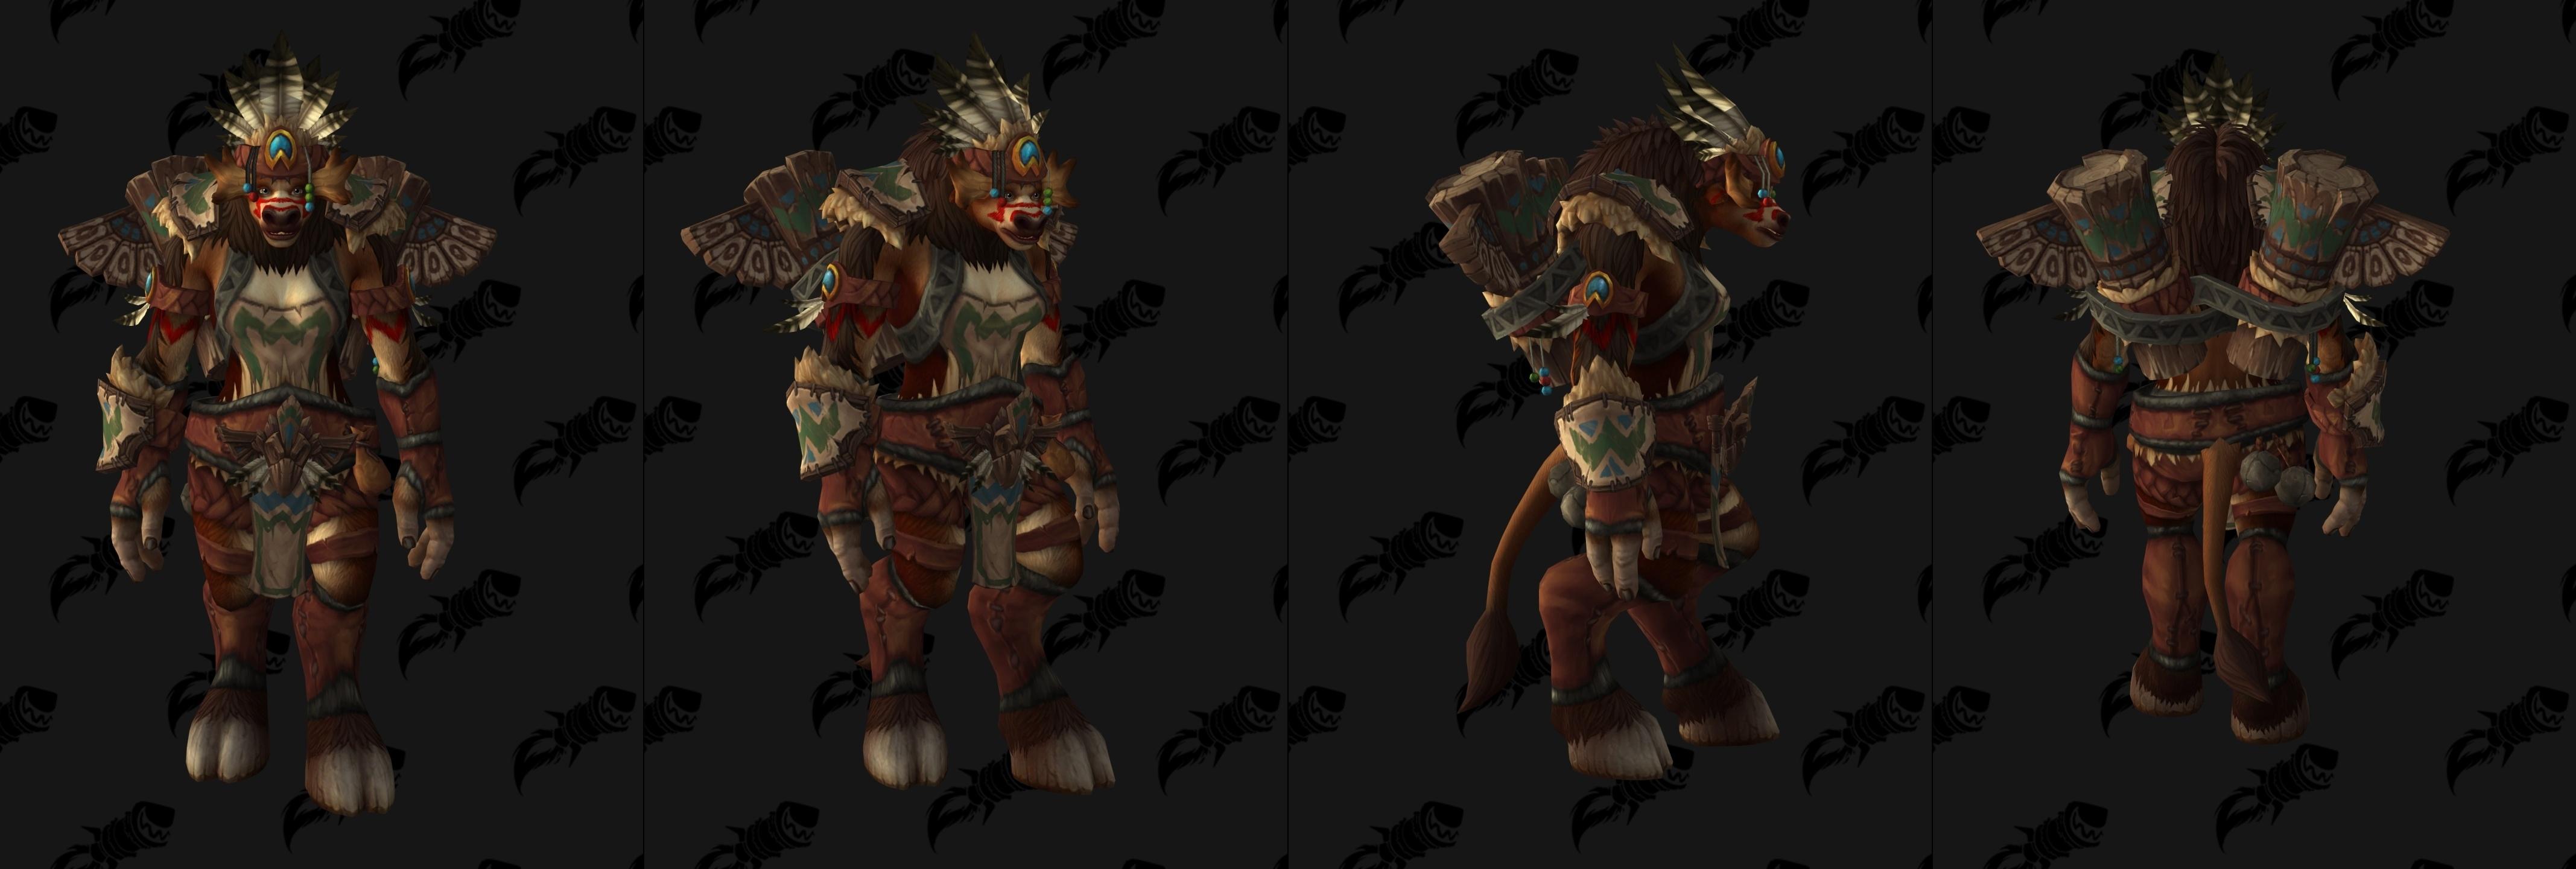 Hochbergtauren - Volk - World of Warcraft